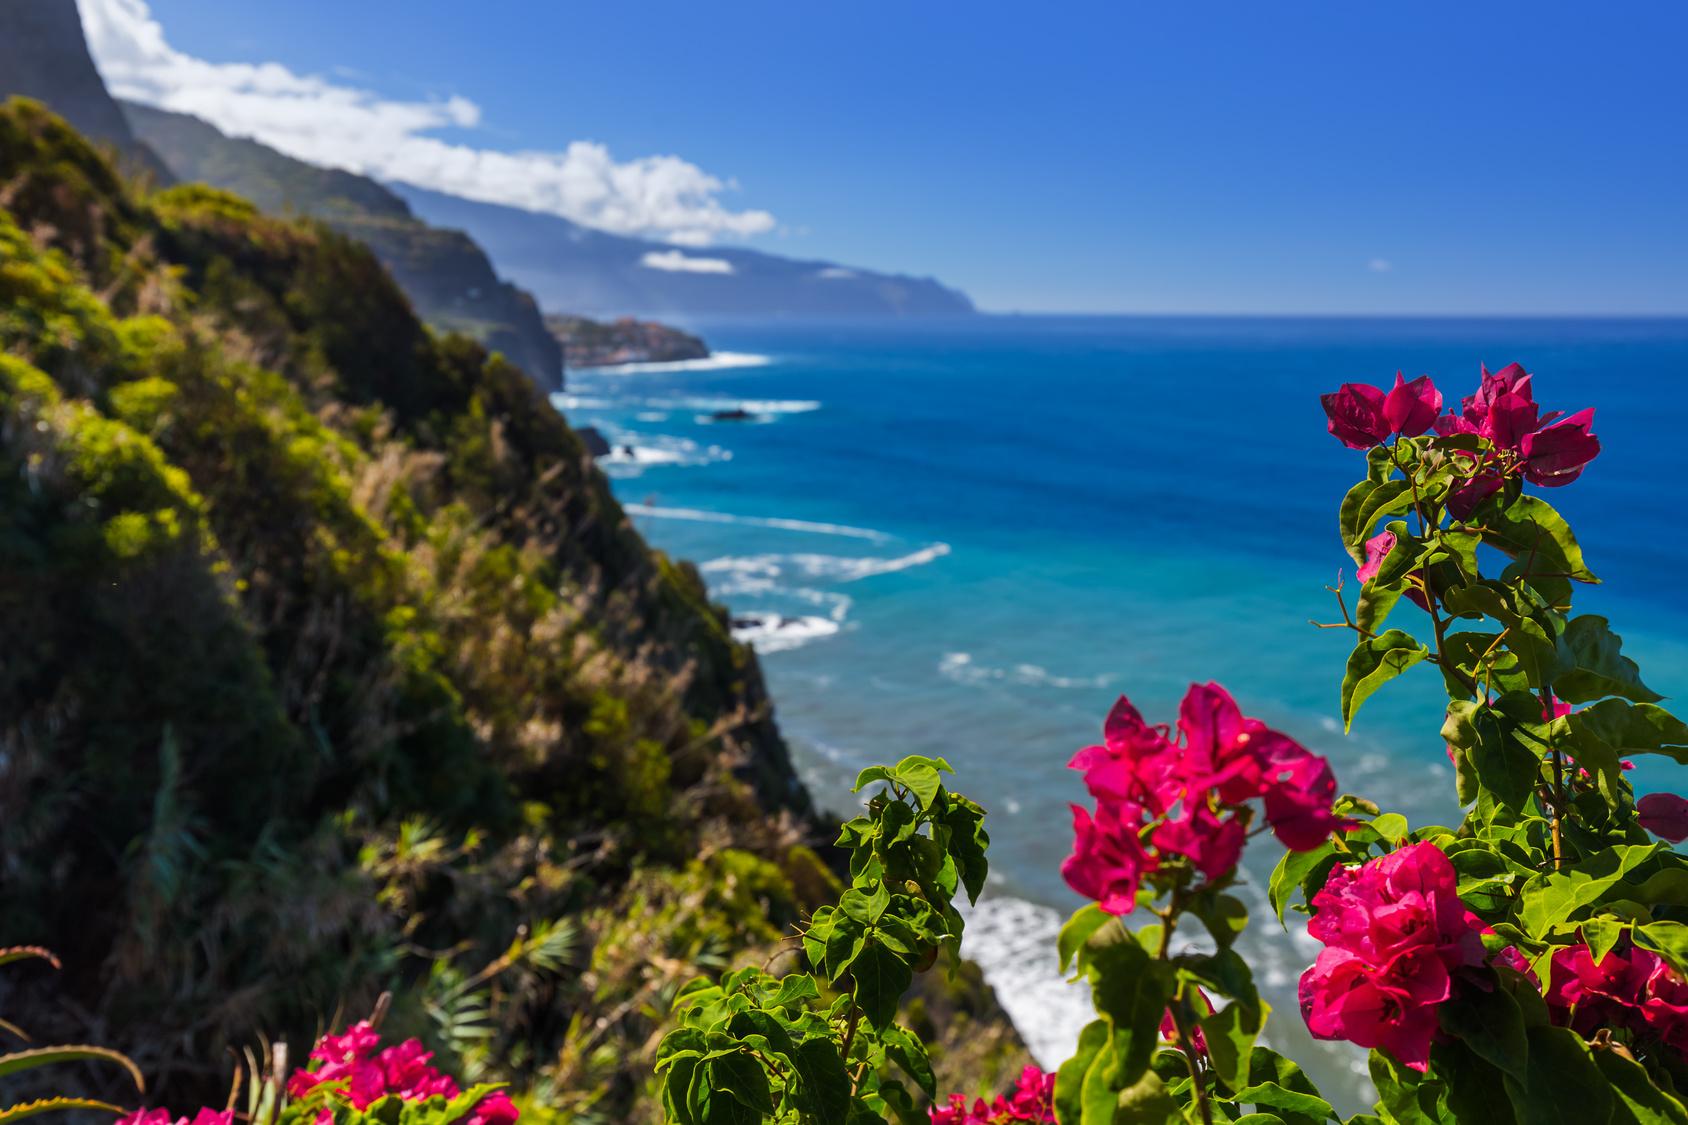 Madera-krajobraz